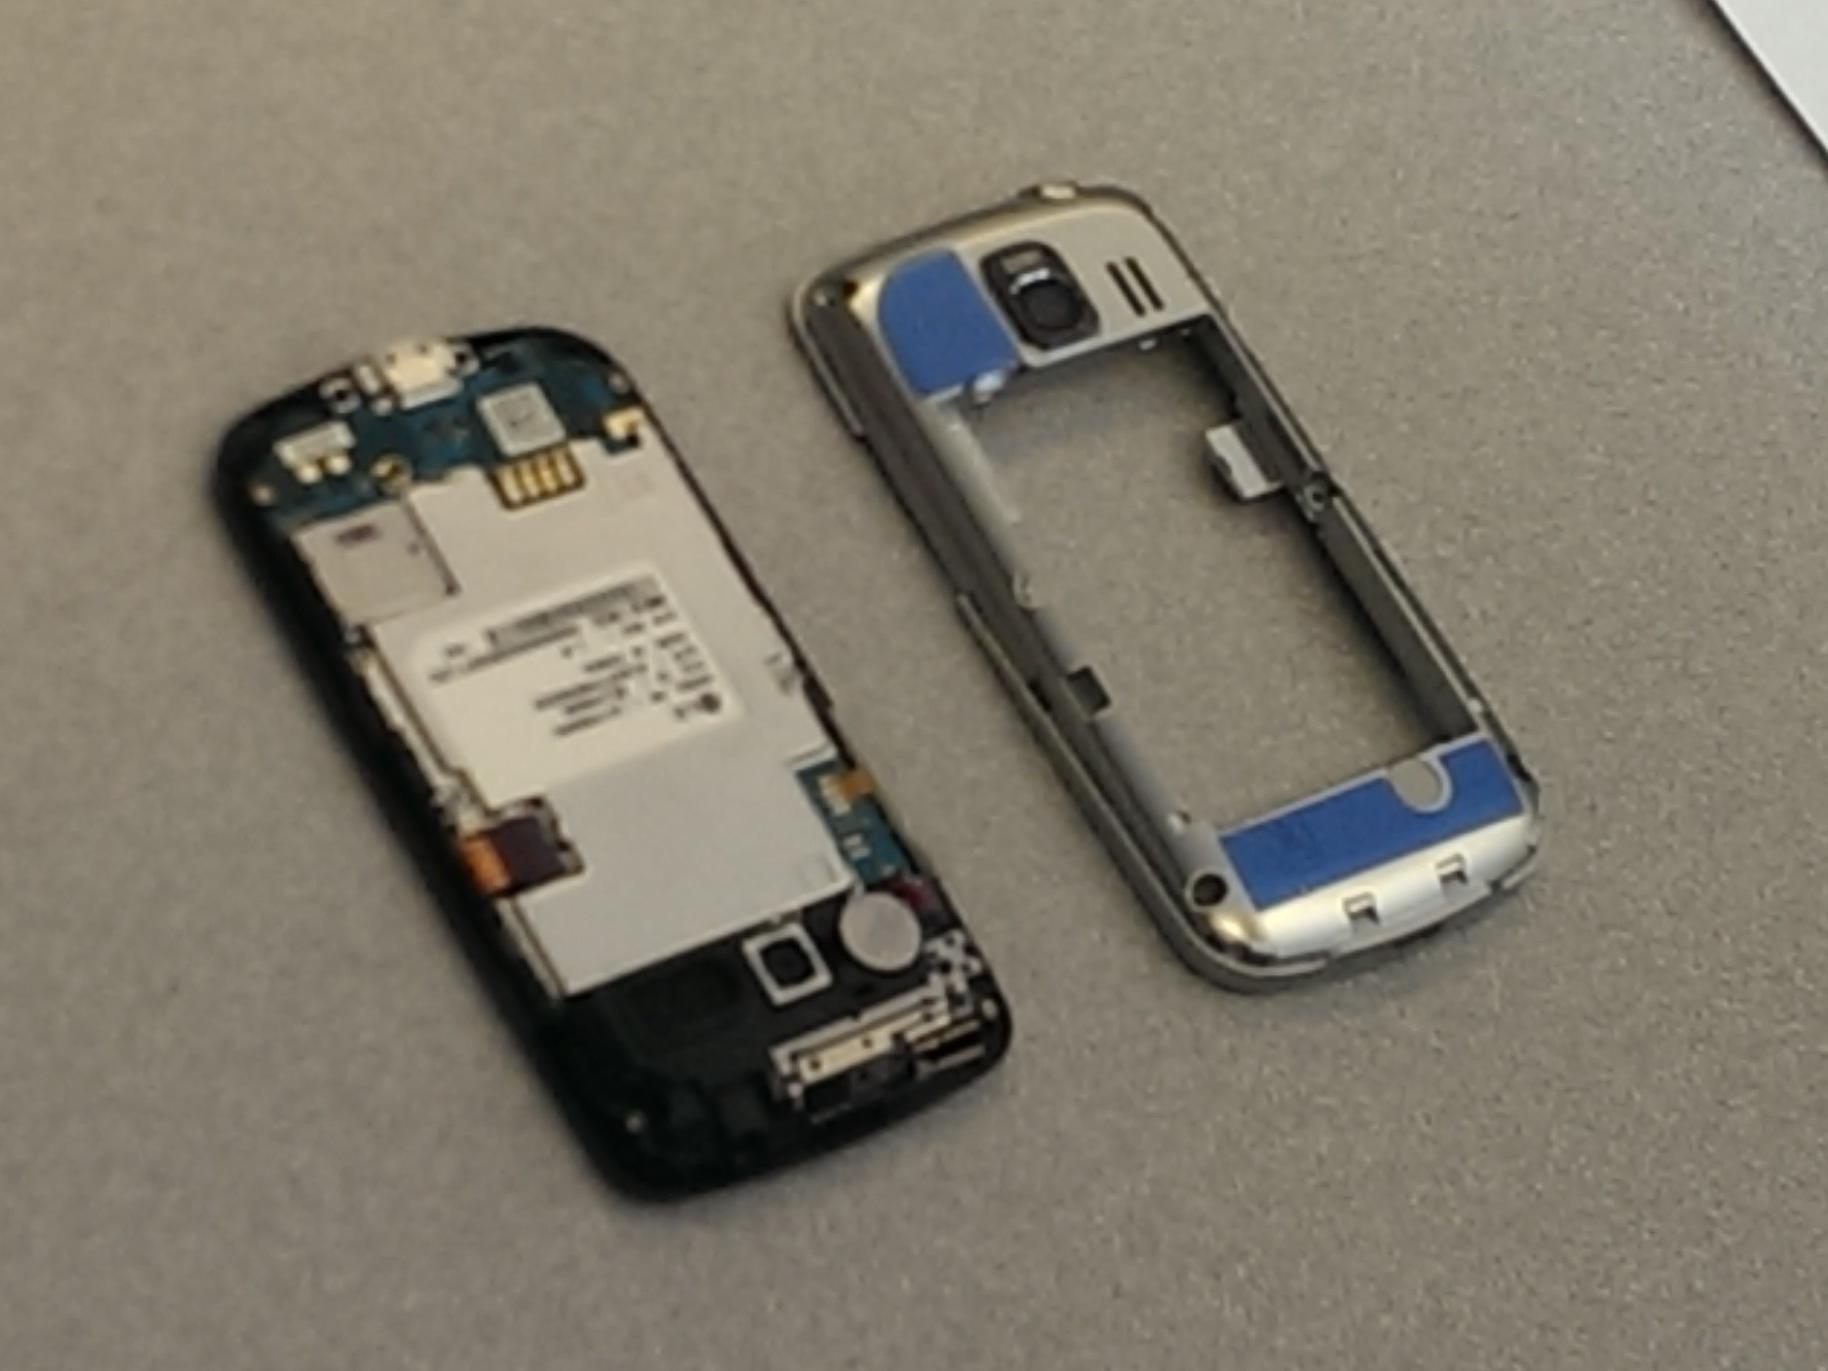 lg vortex screen replacement ifixit repair guide rh ifixit com LG Vortex Phone Cases LG Vortex Help